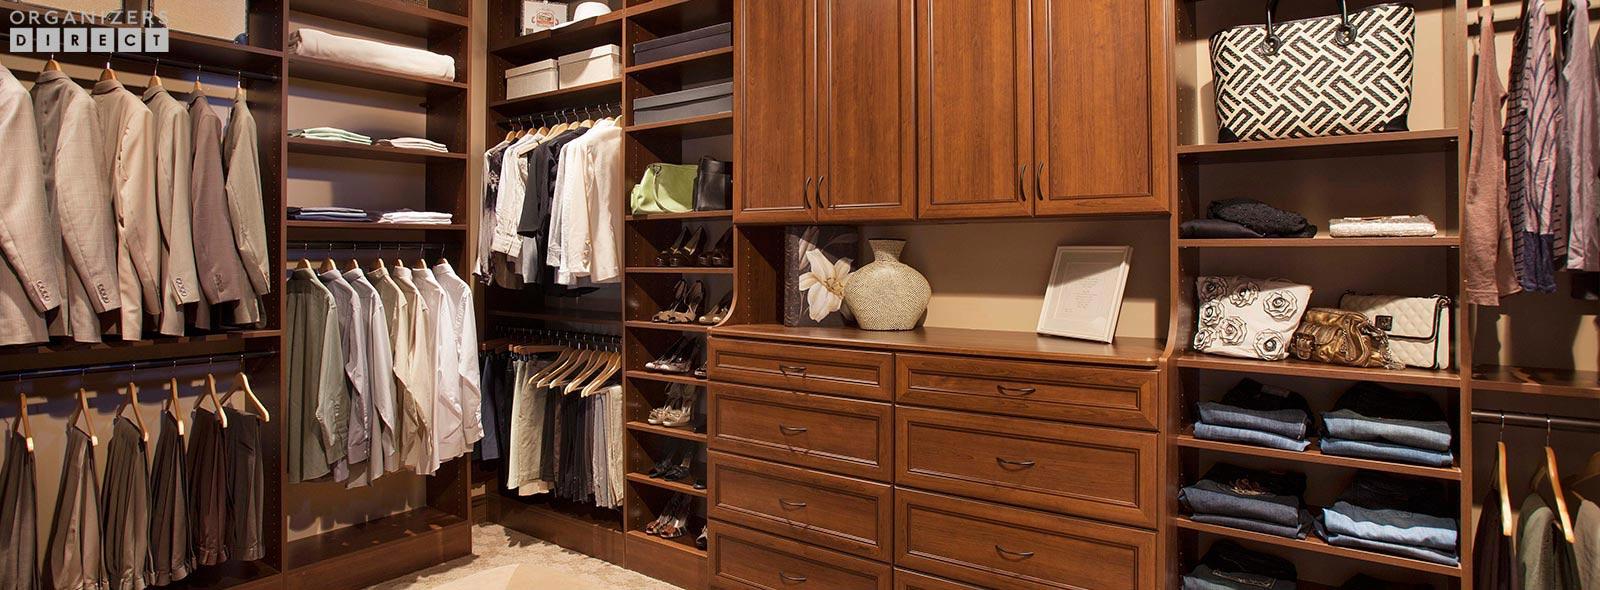 Unique Storage And Organizers Custom Home Organization